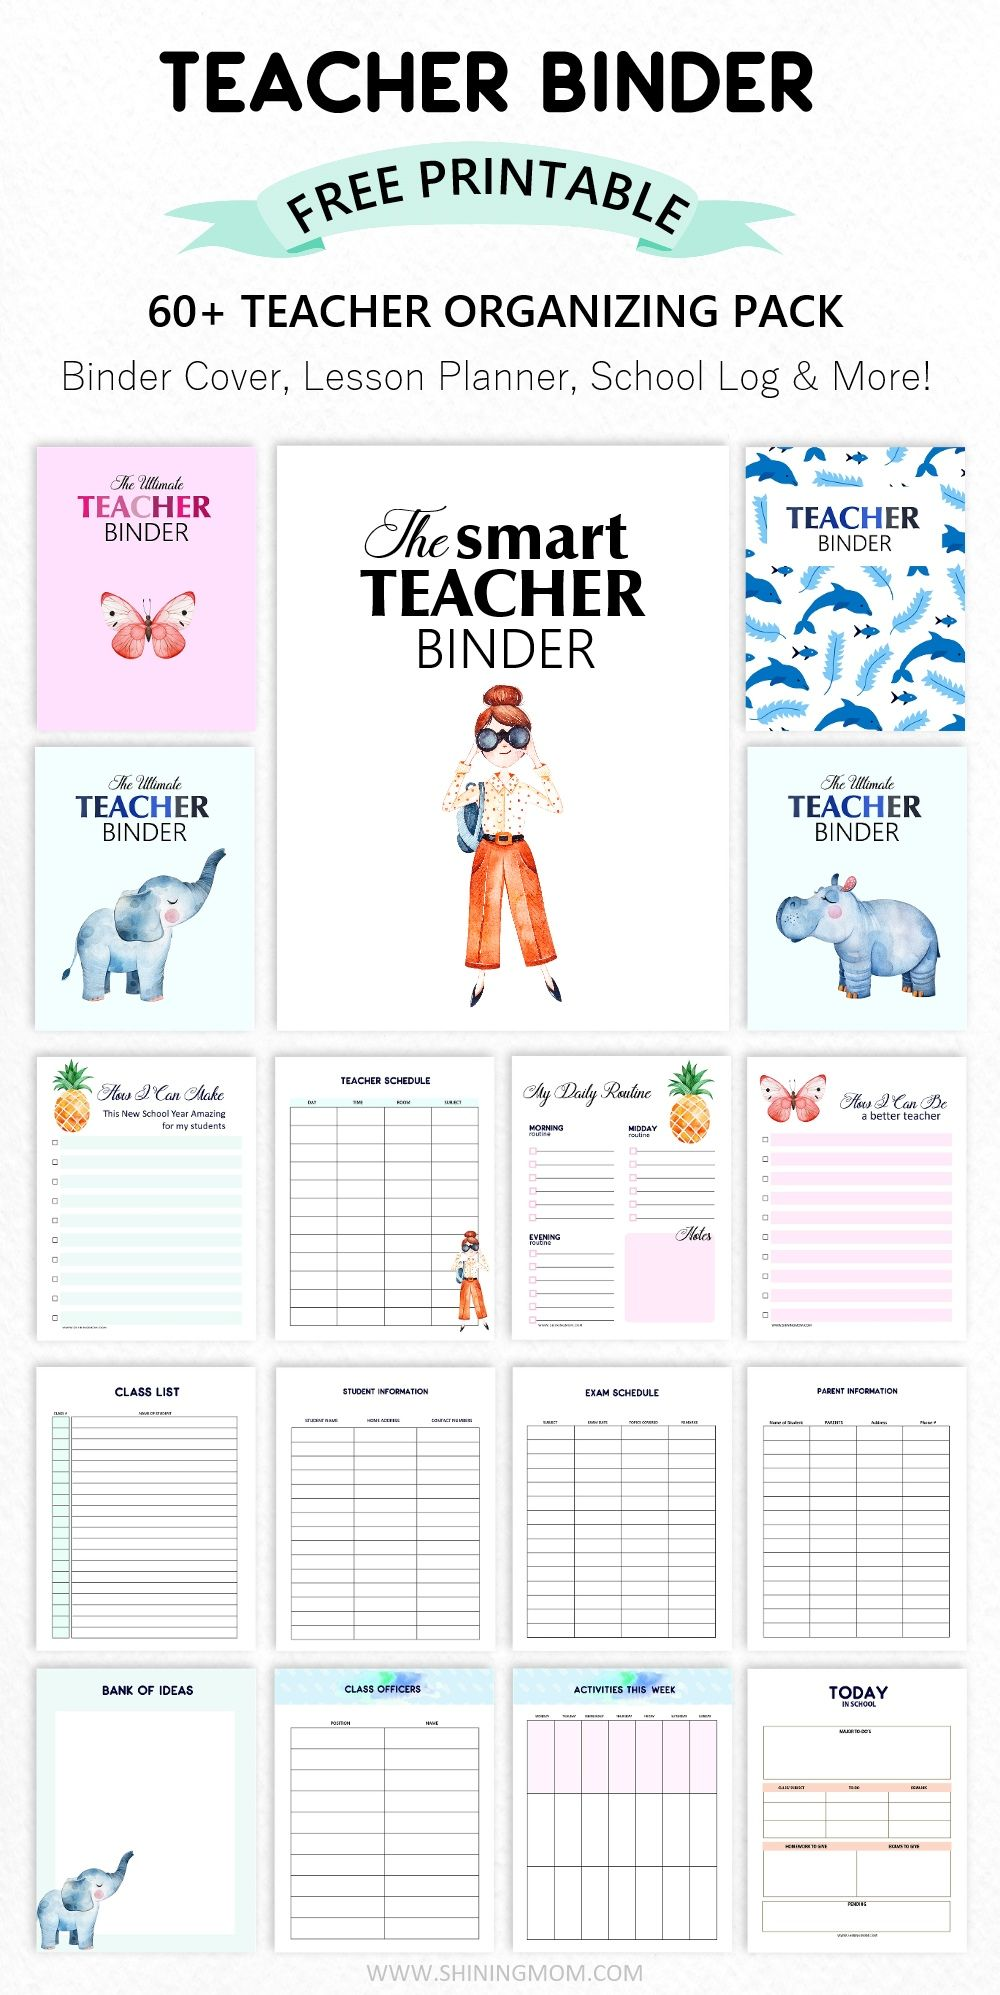 FREE Teacher Binder: 60+ Outstanding Organizing Printables! #teacherplannerfree